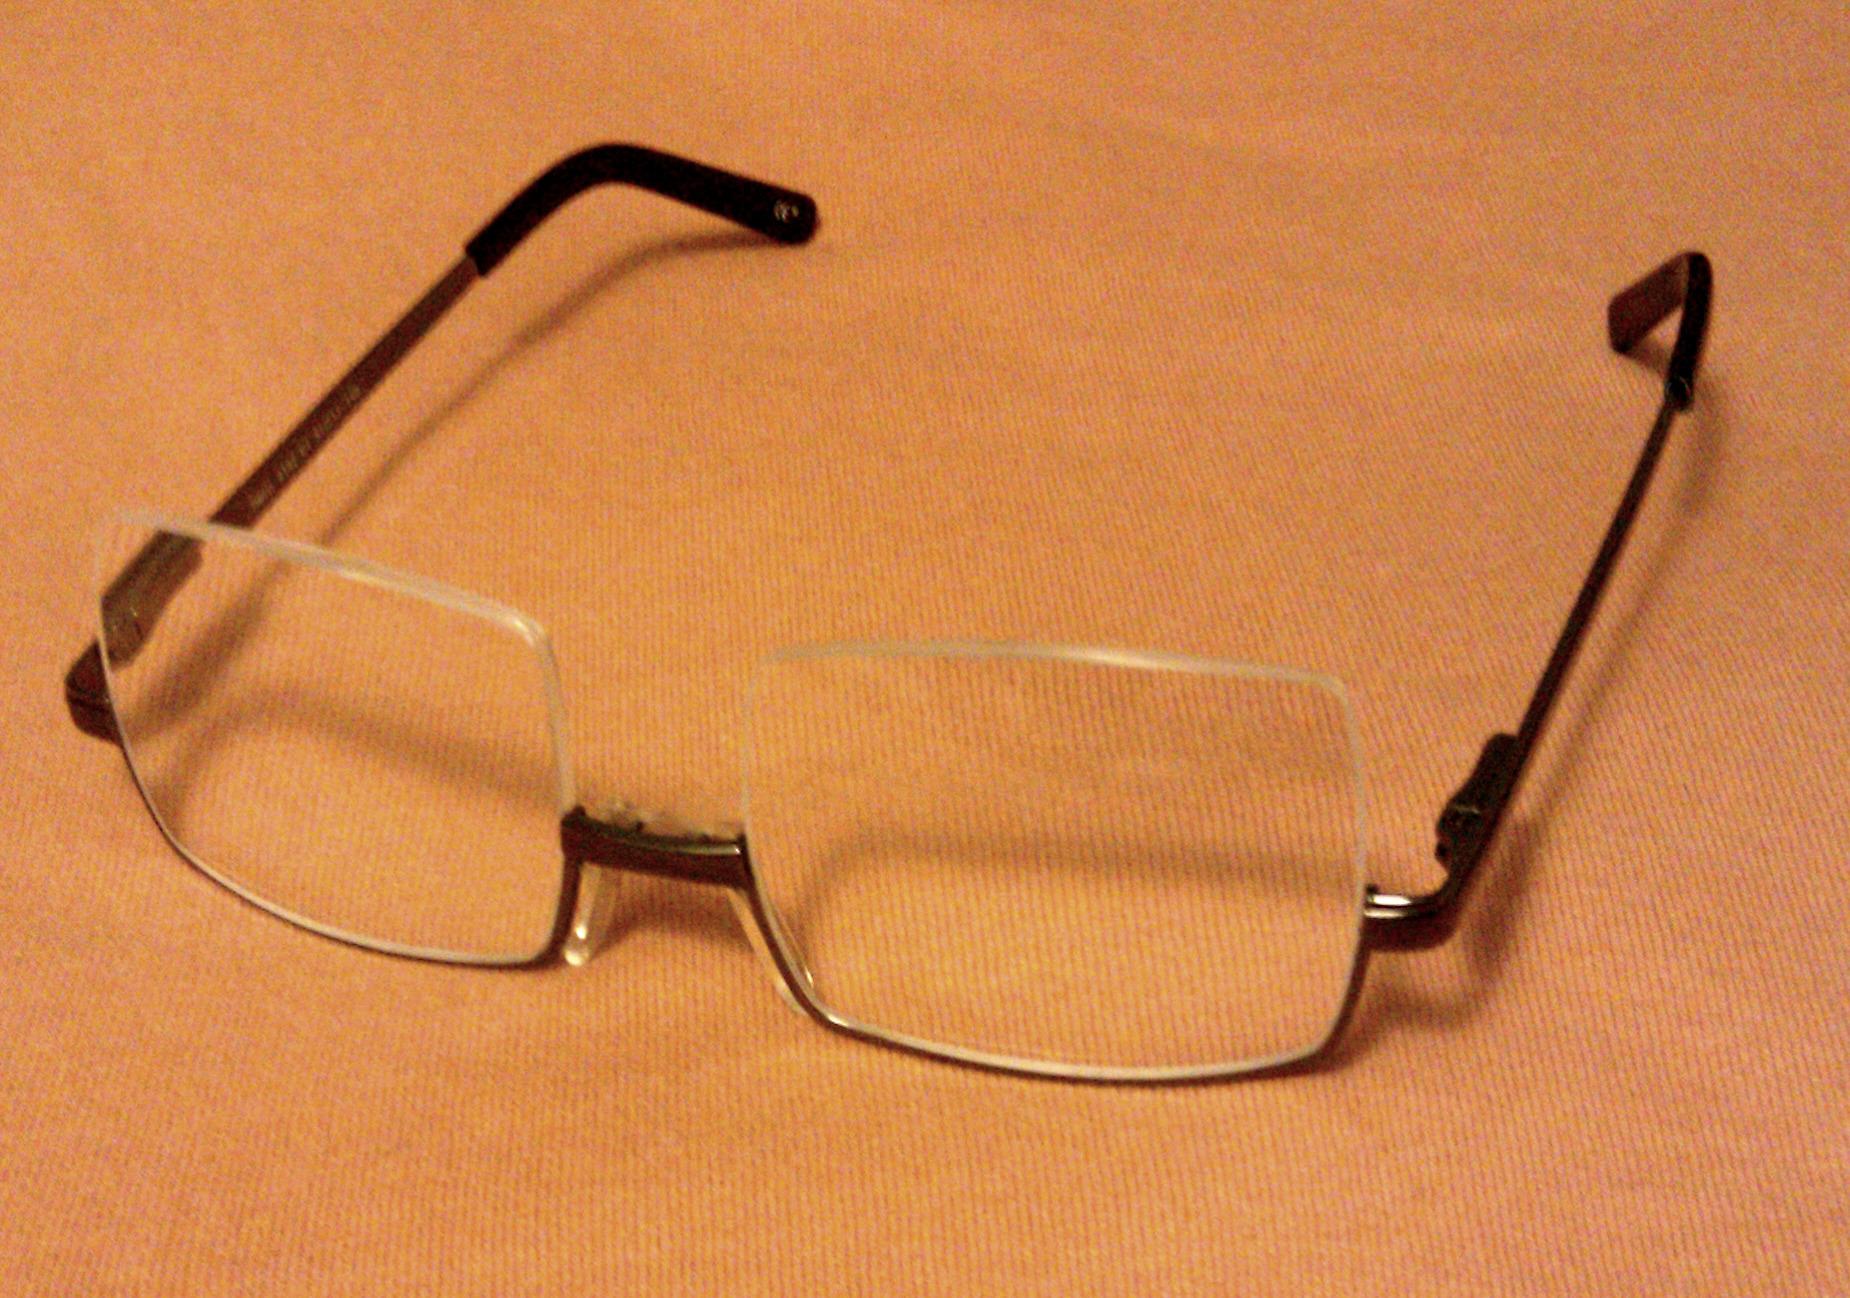 12d9726edbca File Billiards glasses.jpg - Wikipedia